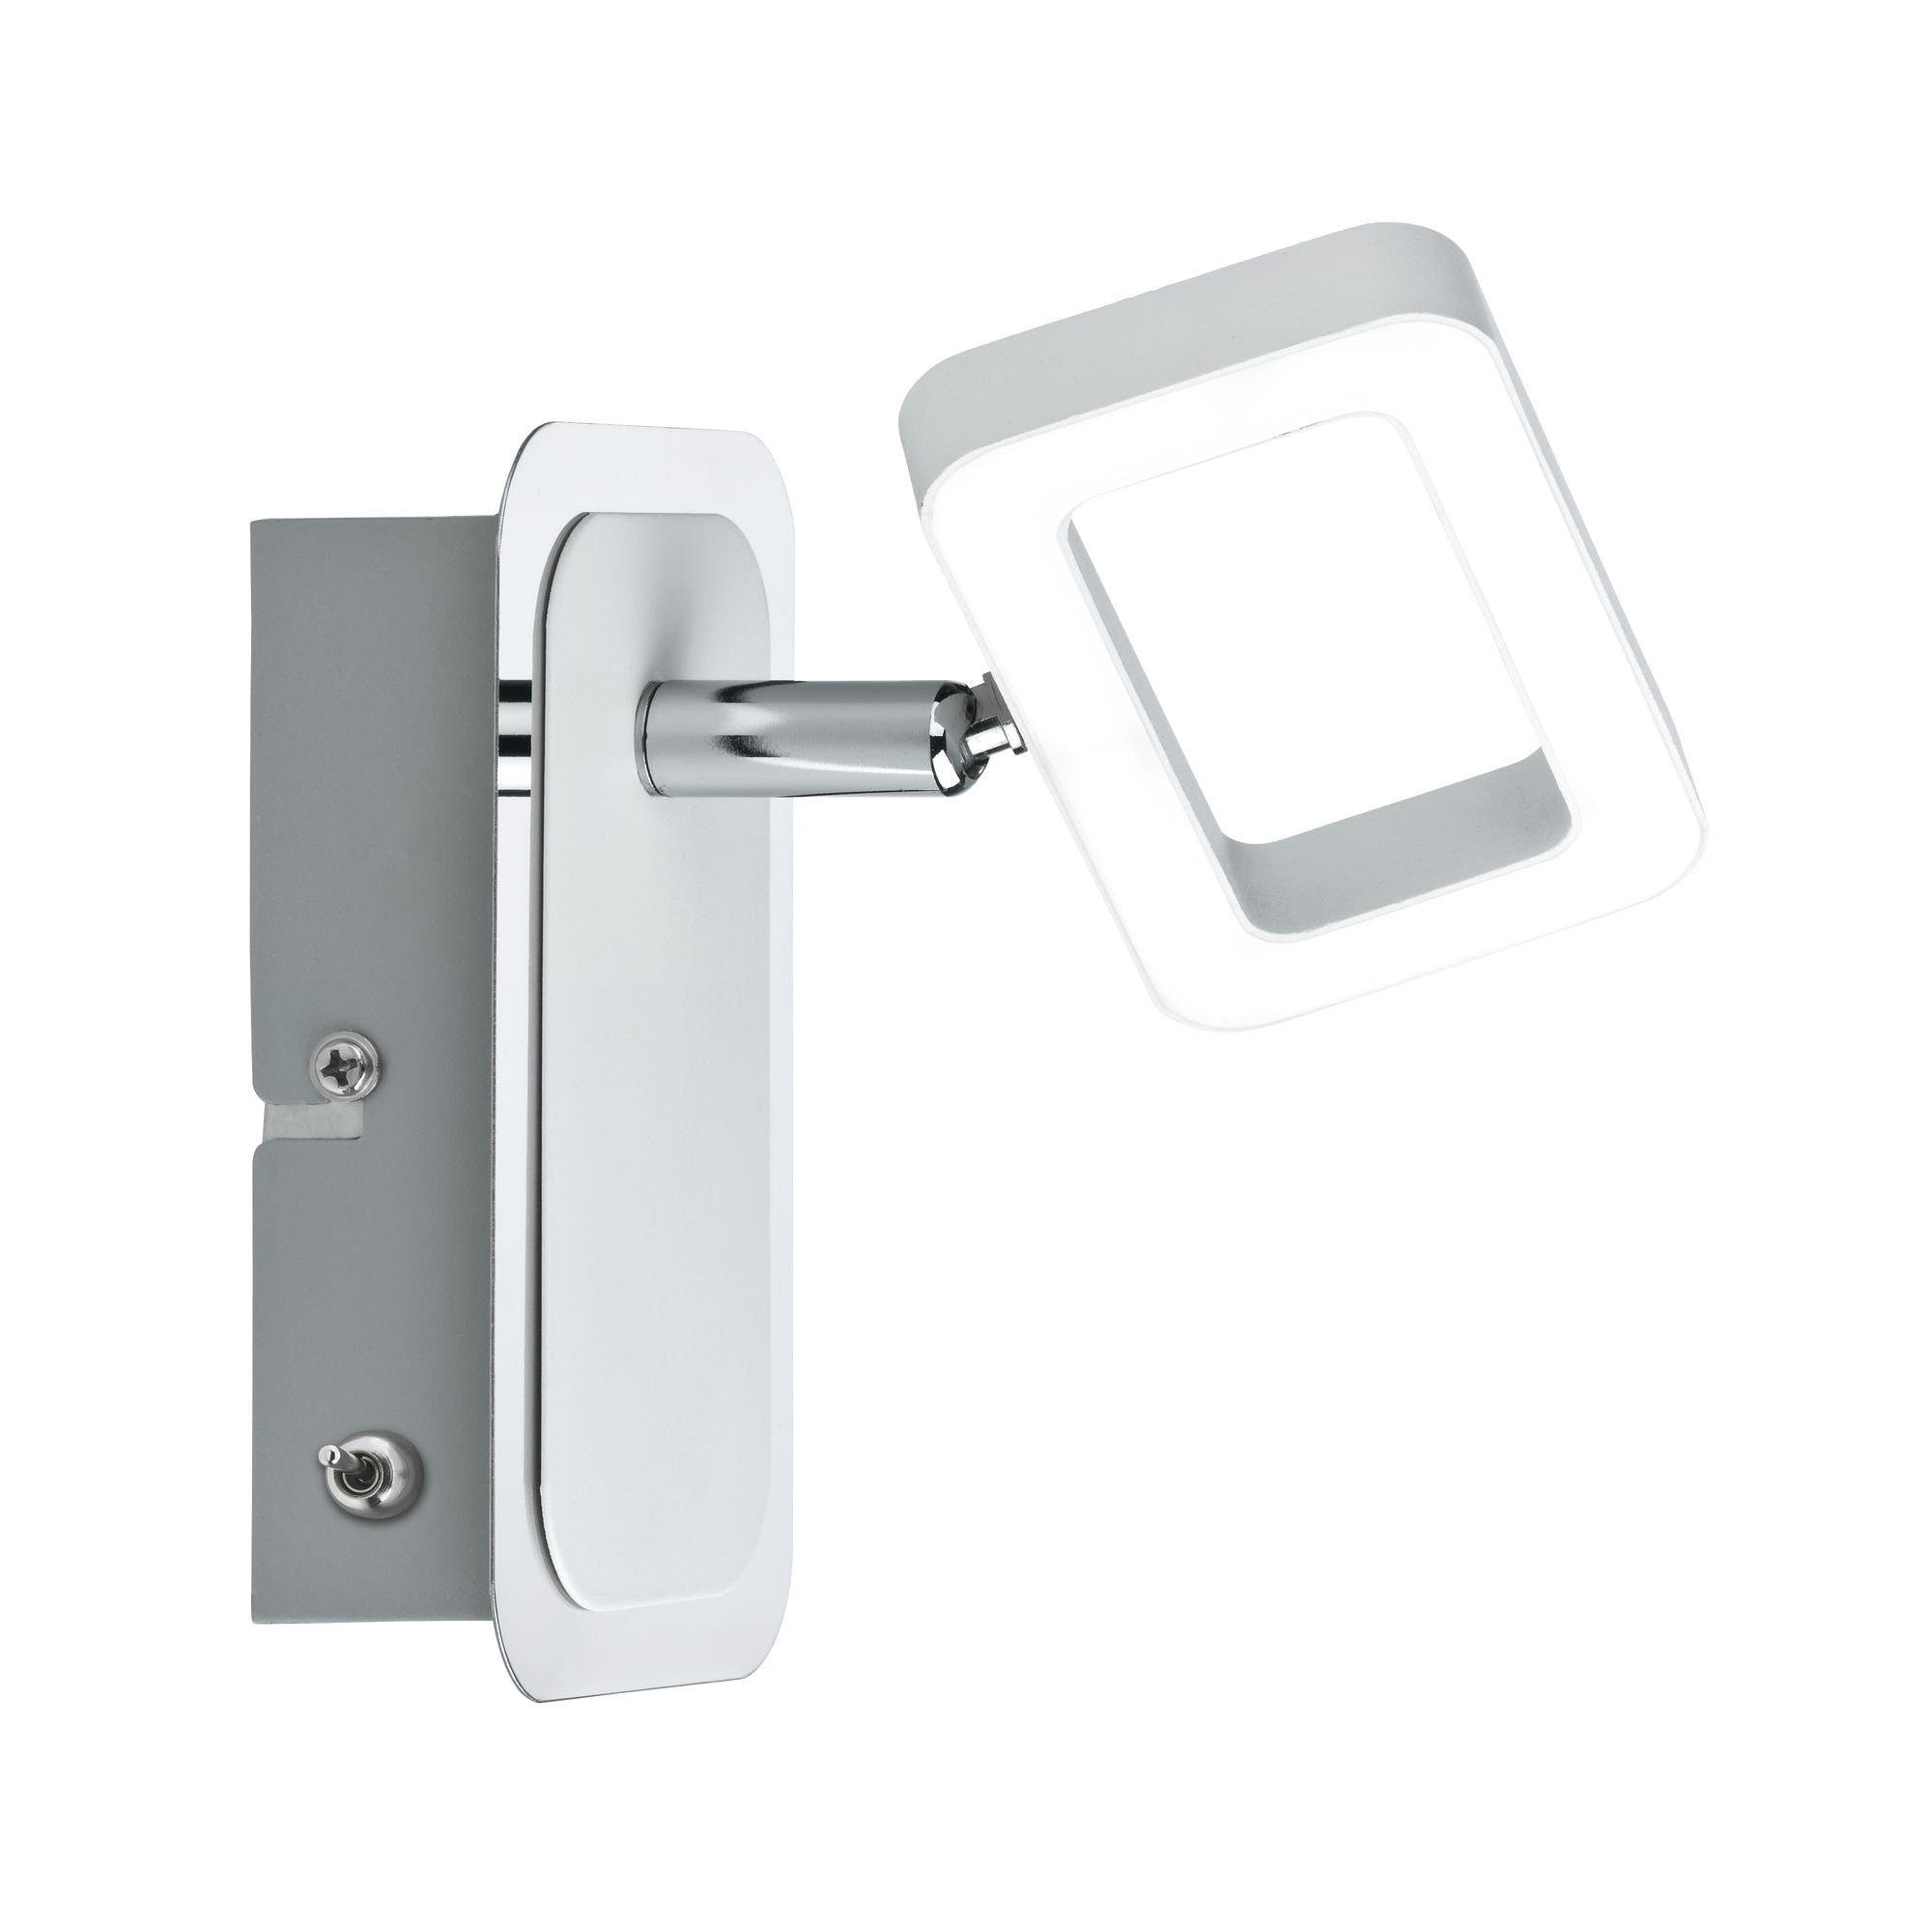 Paulmann,LED Wandstrahler Frame Weiß/Chrom 1-flammig inkl. Leuchtmittel 1x4,5W